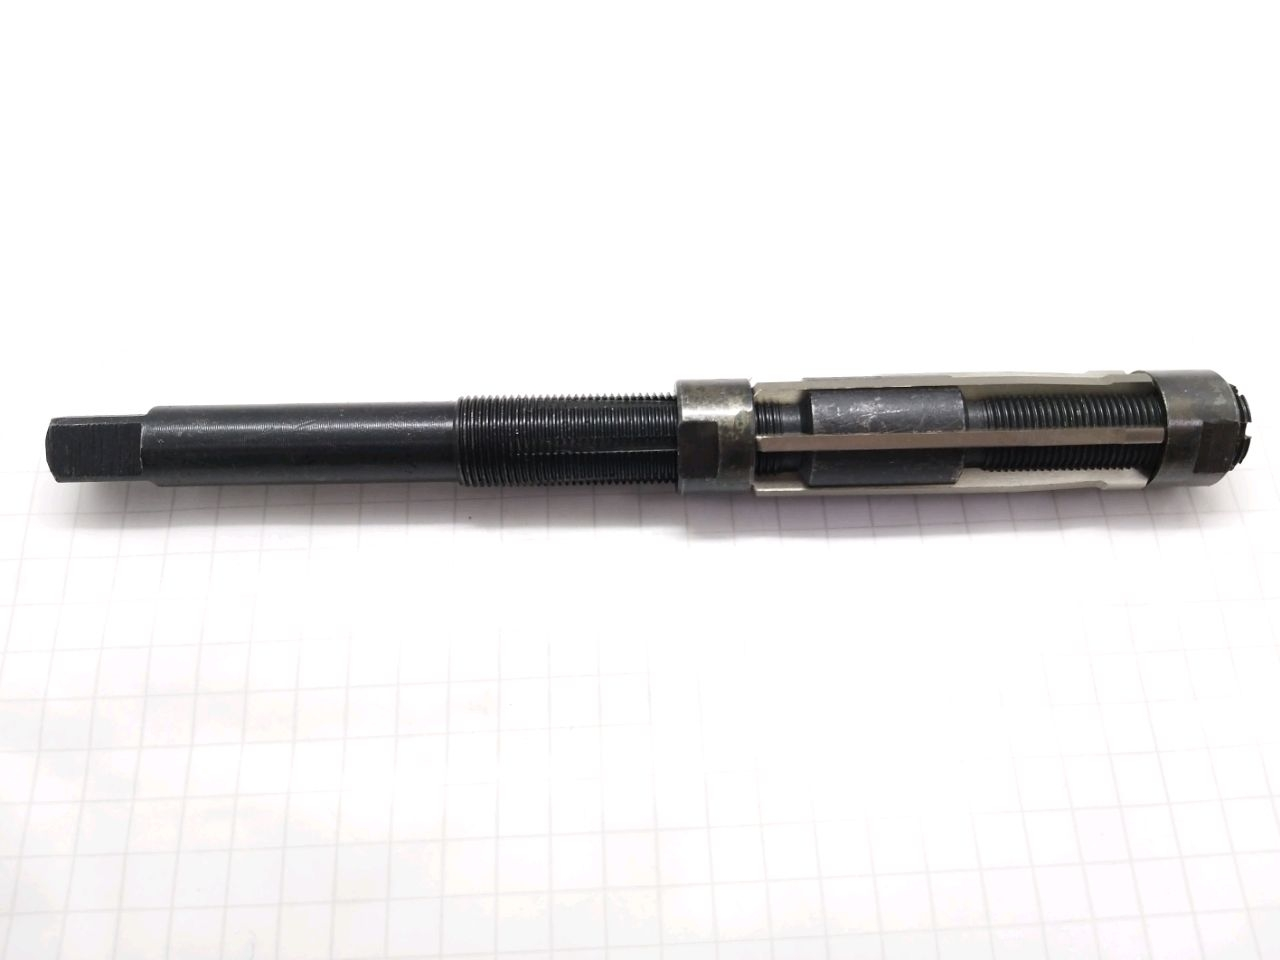 Alezor reglabil HSS 13,75-15,25mm